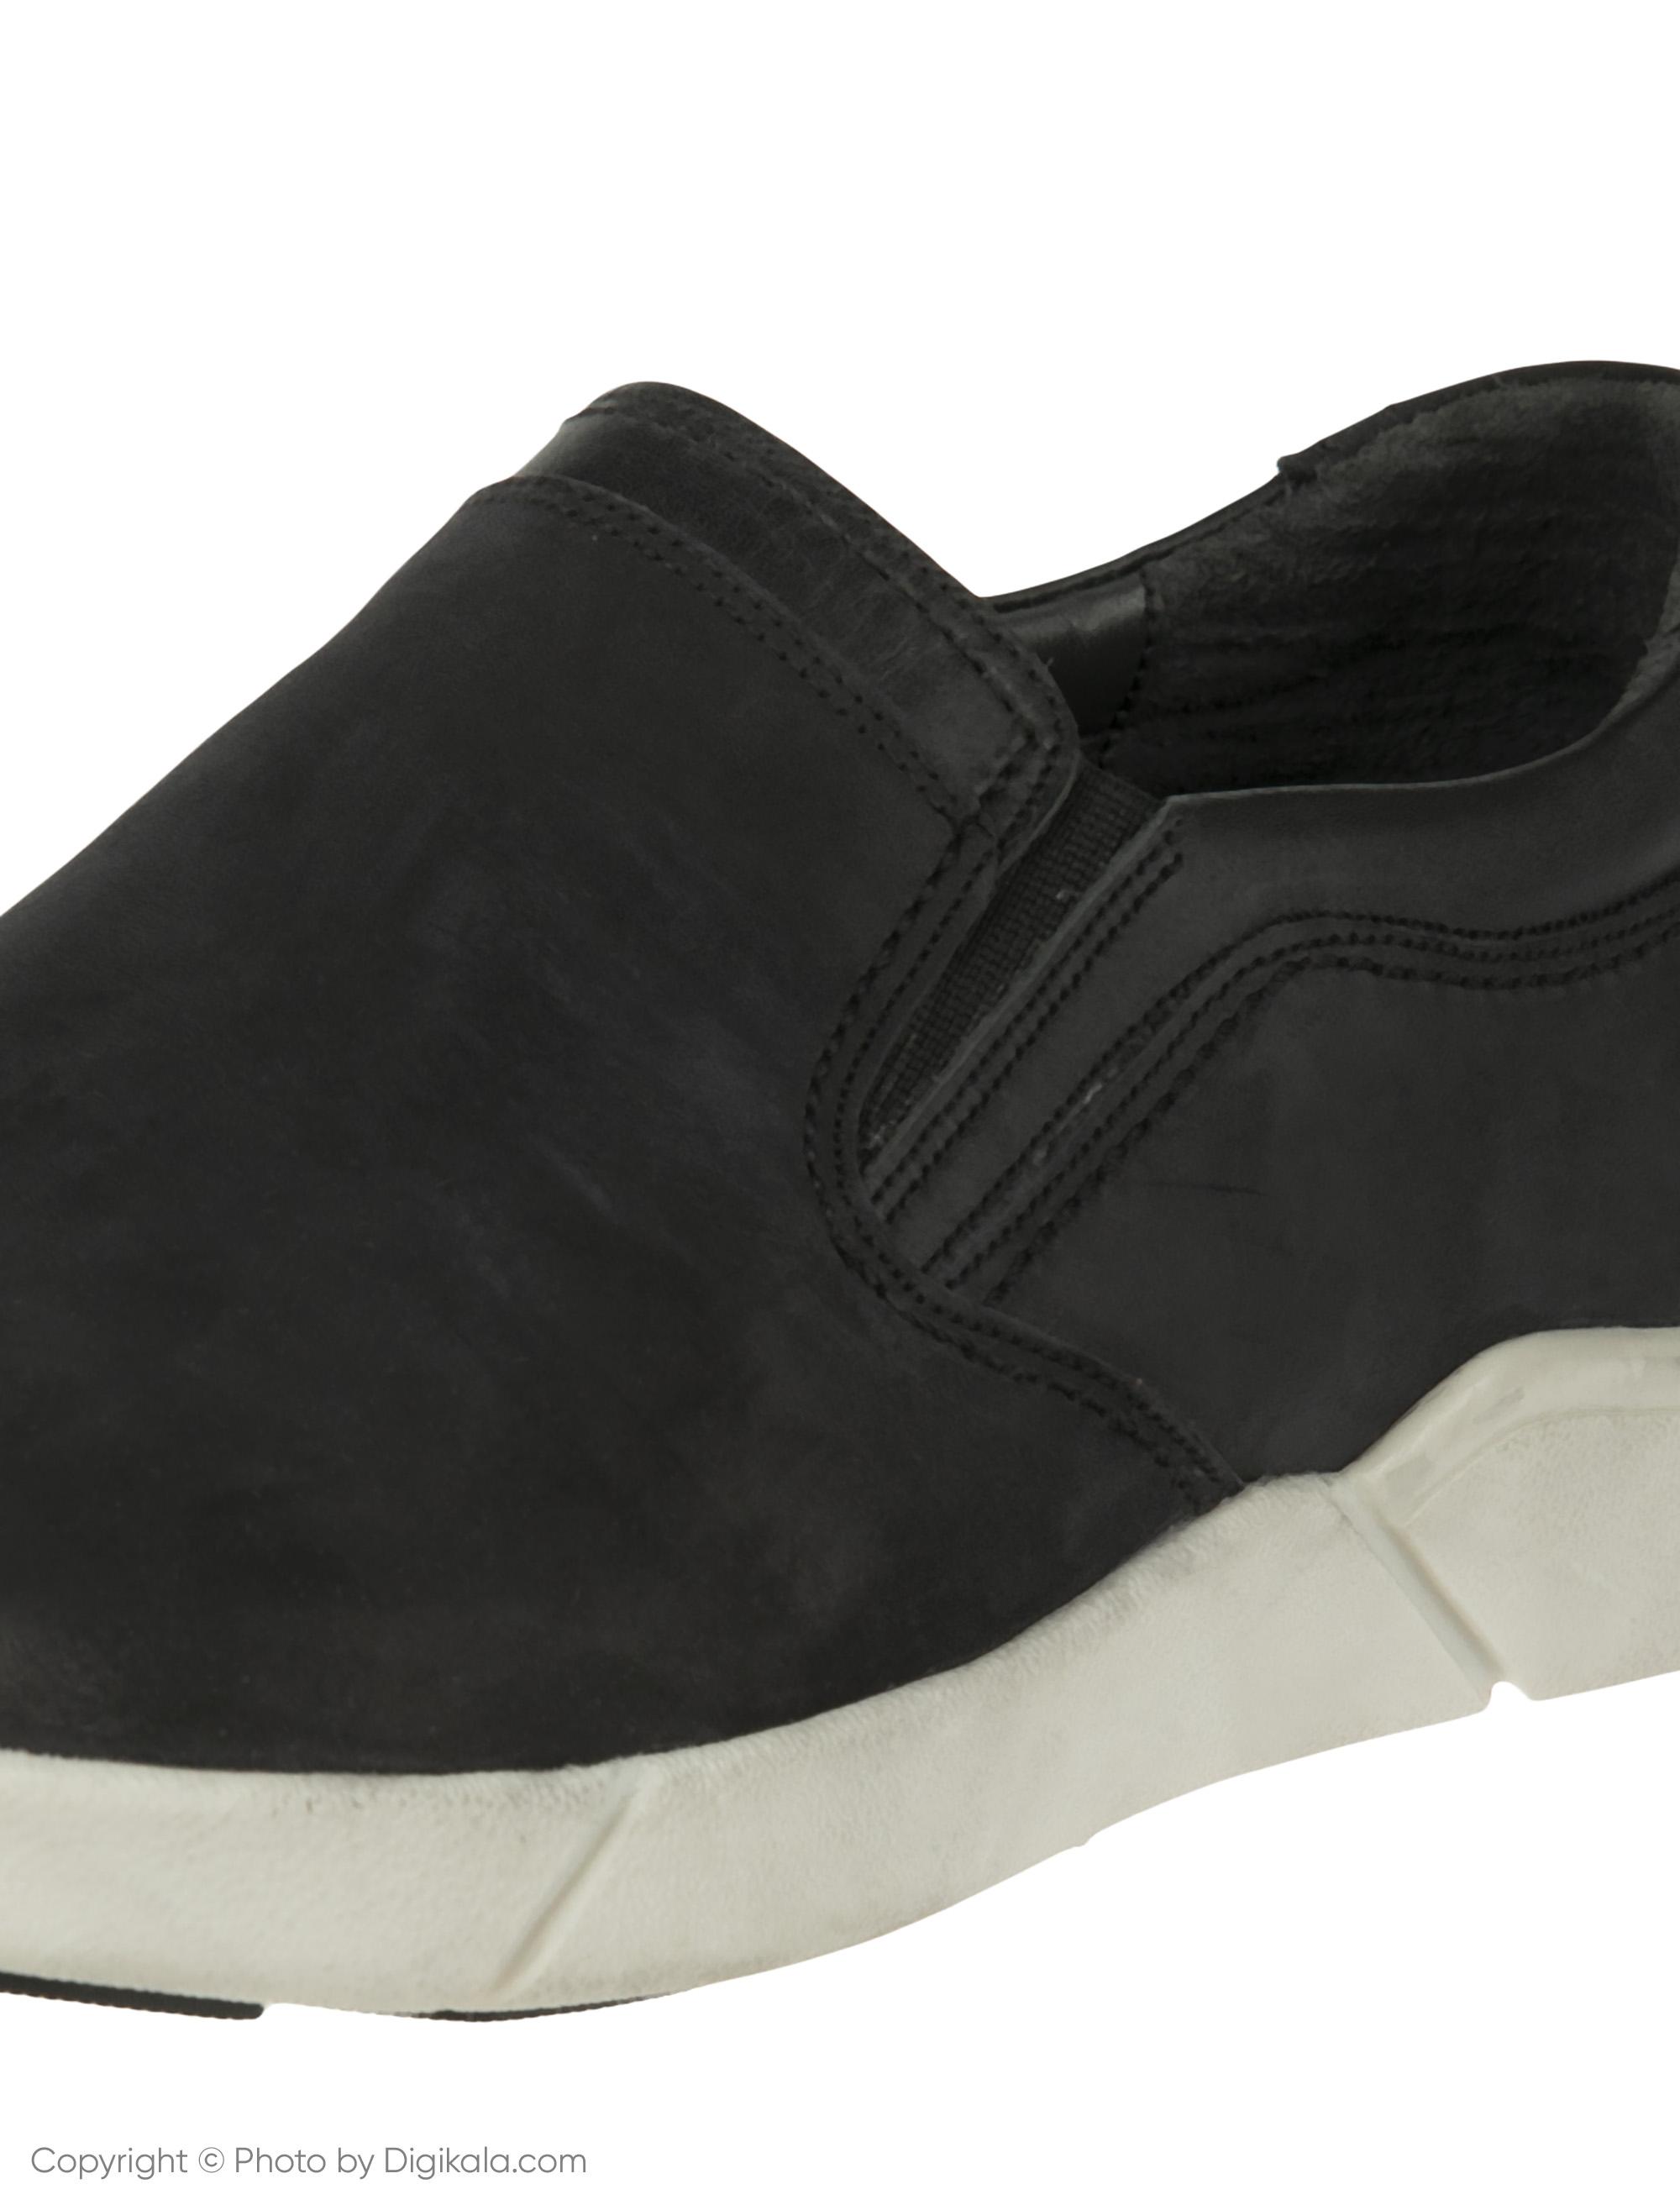 کفش روزمره مردانه ساتین مدل SN7178A-101 -  - 6